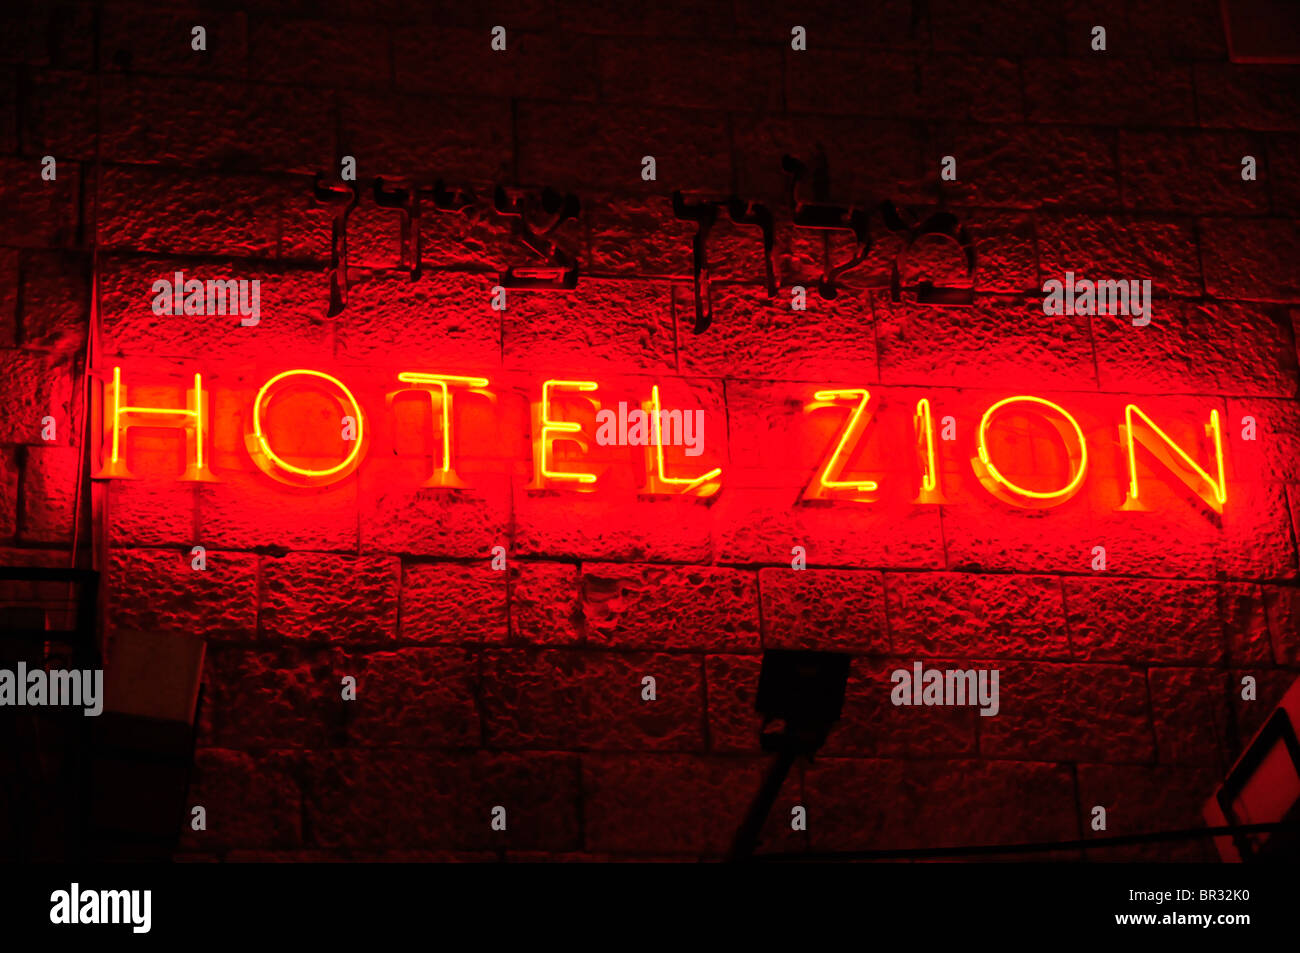 Hotel Sion in illuminazione serale, Gerusalemme, Israele, Medio Oriente, l'Orient Immagini Stock